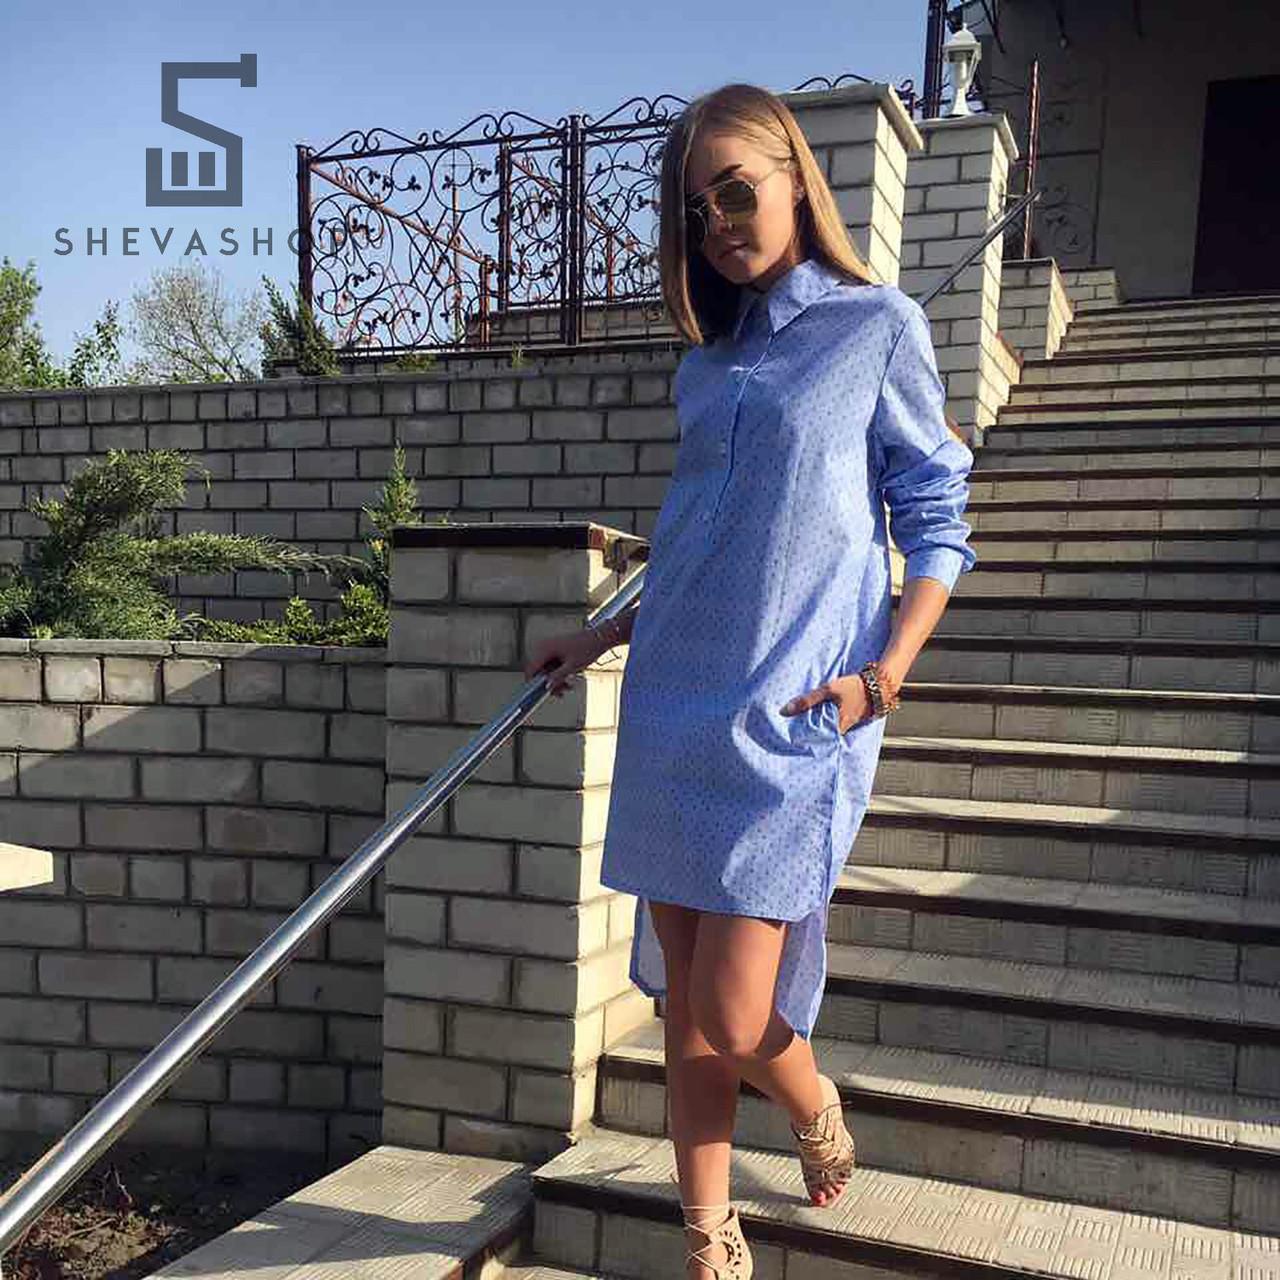 Летнее платье-рубашка Ann Undine голубое